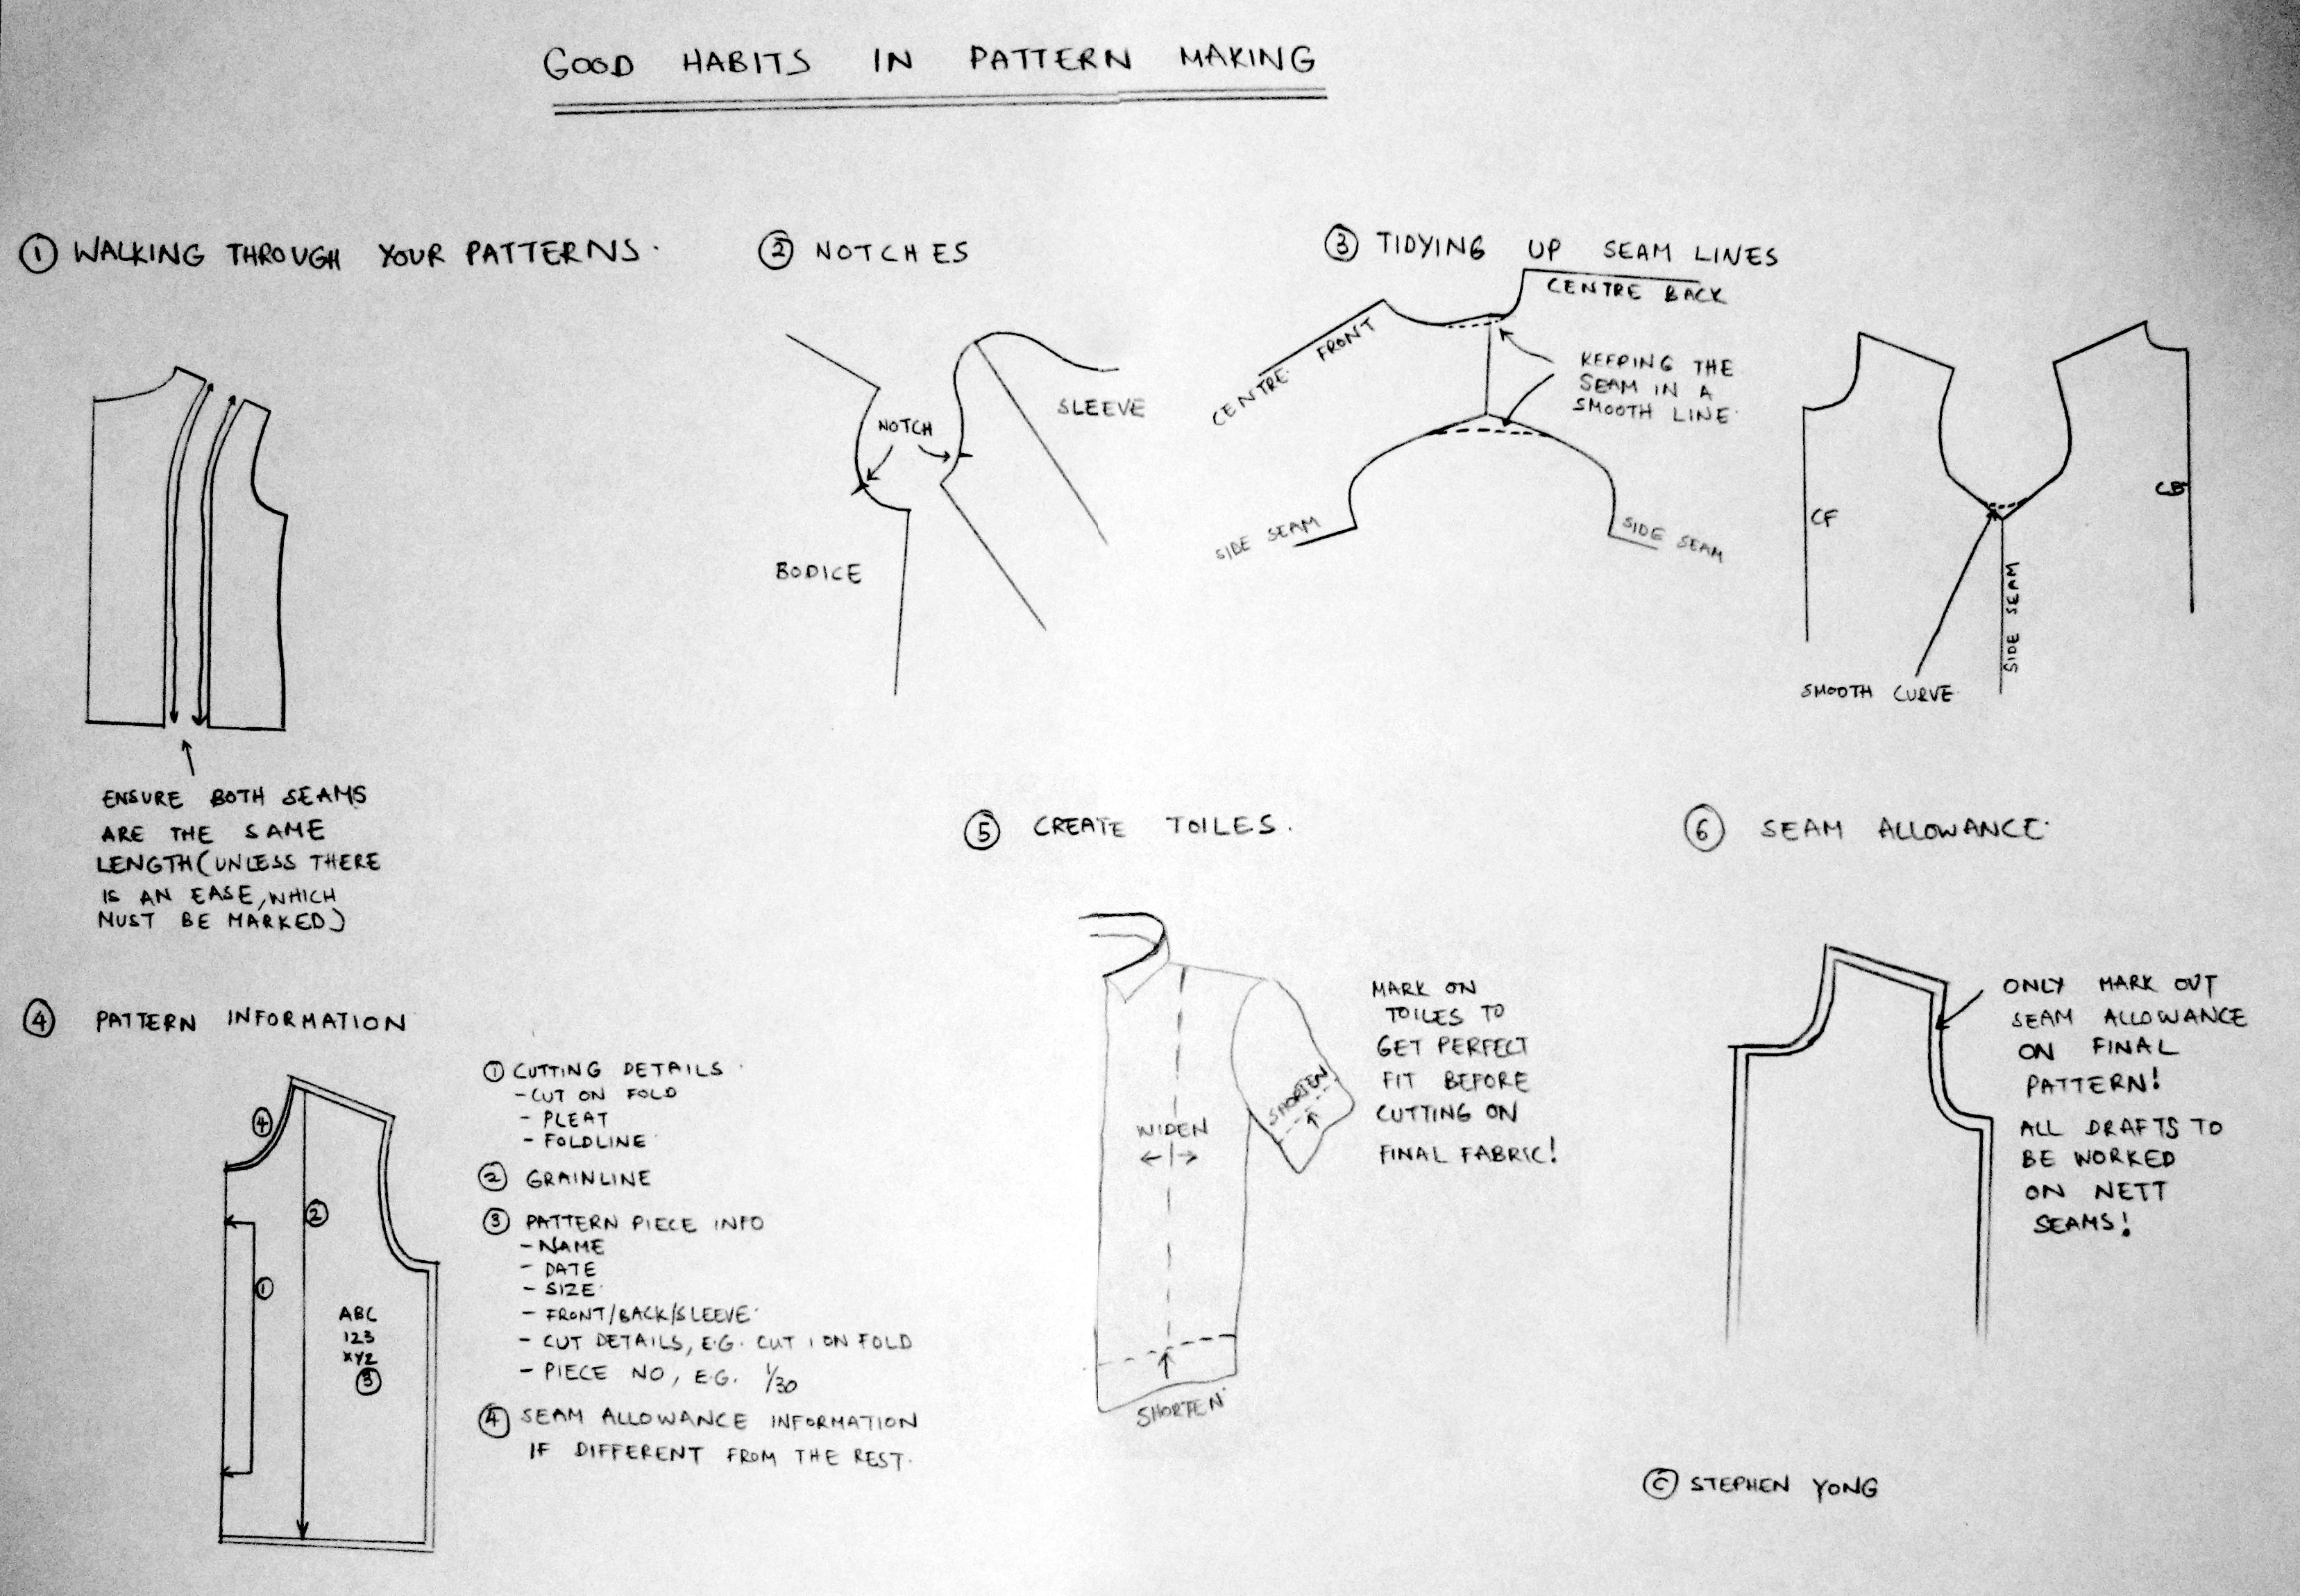 Good Habits in Pattern Making! | Stephen Yong